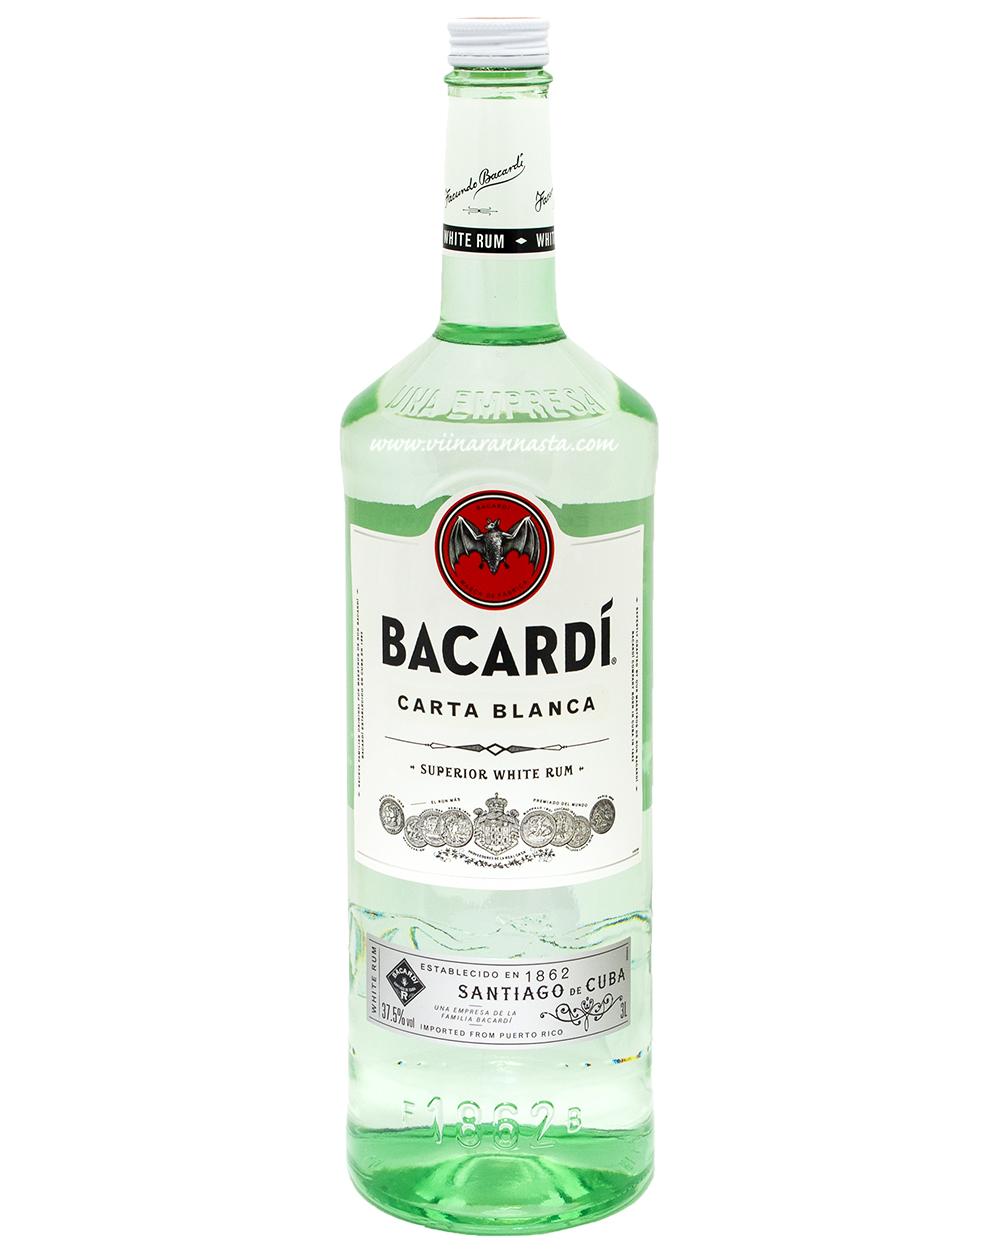 Bacardi Carta Blanca 37,5% 300cl